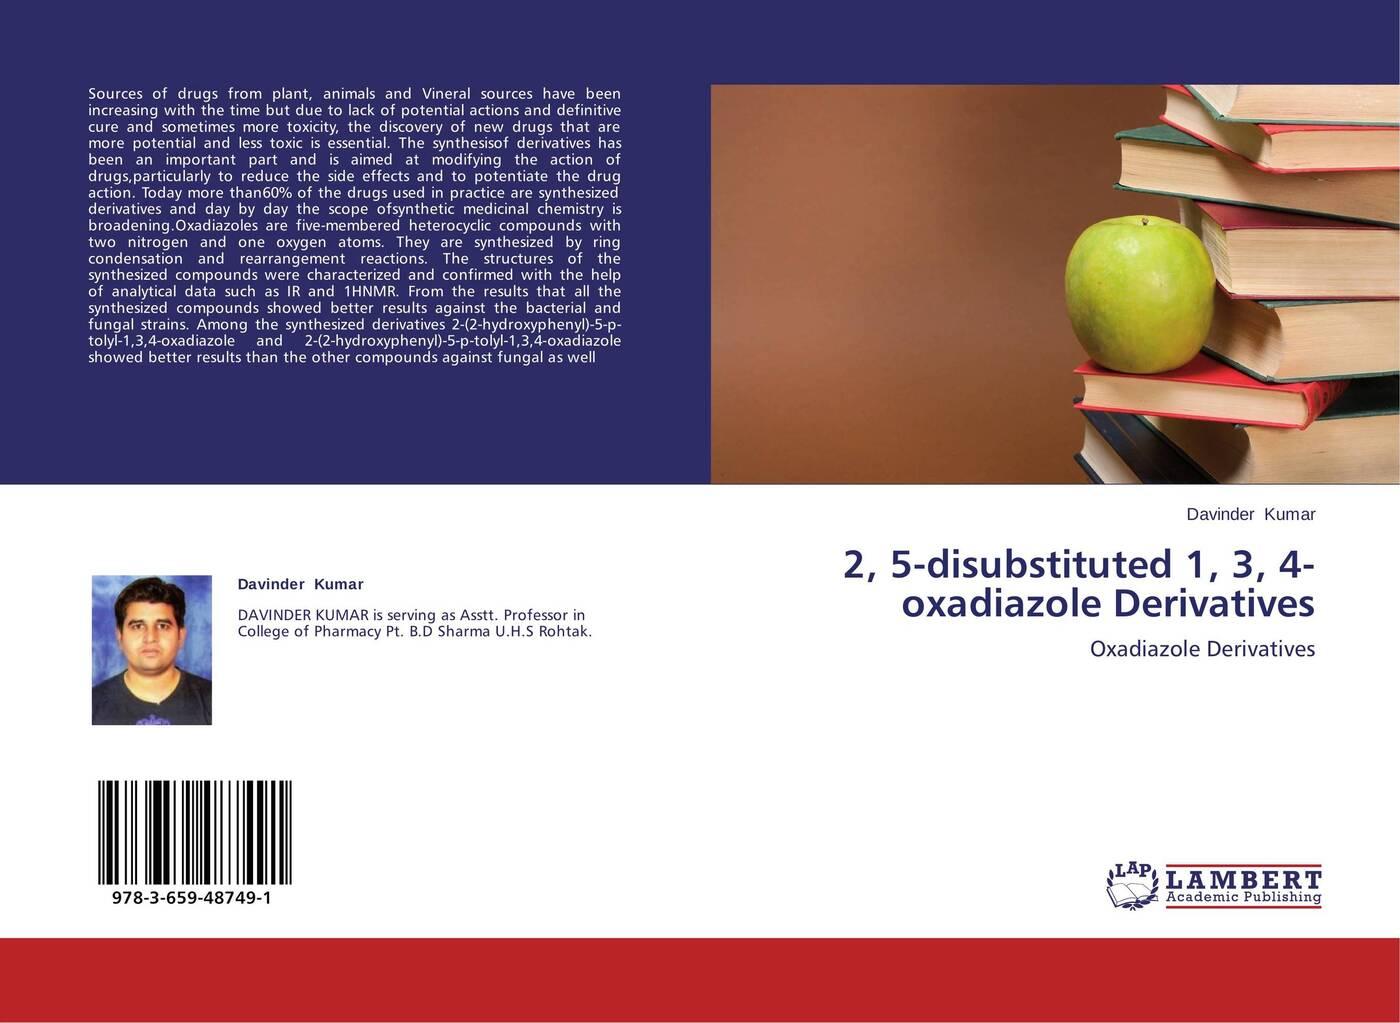 цена на Davinder Kumar 2, 5-disubstituted 1, 3, 4-oxadiazole Derivatives